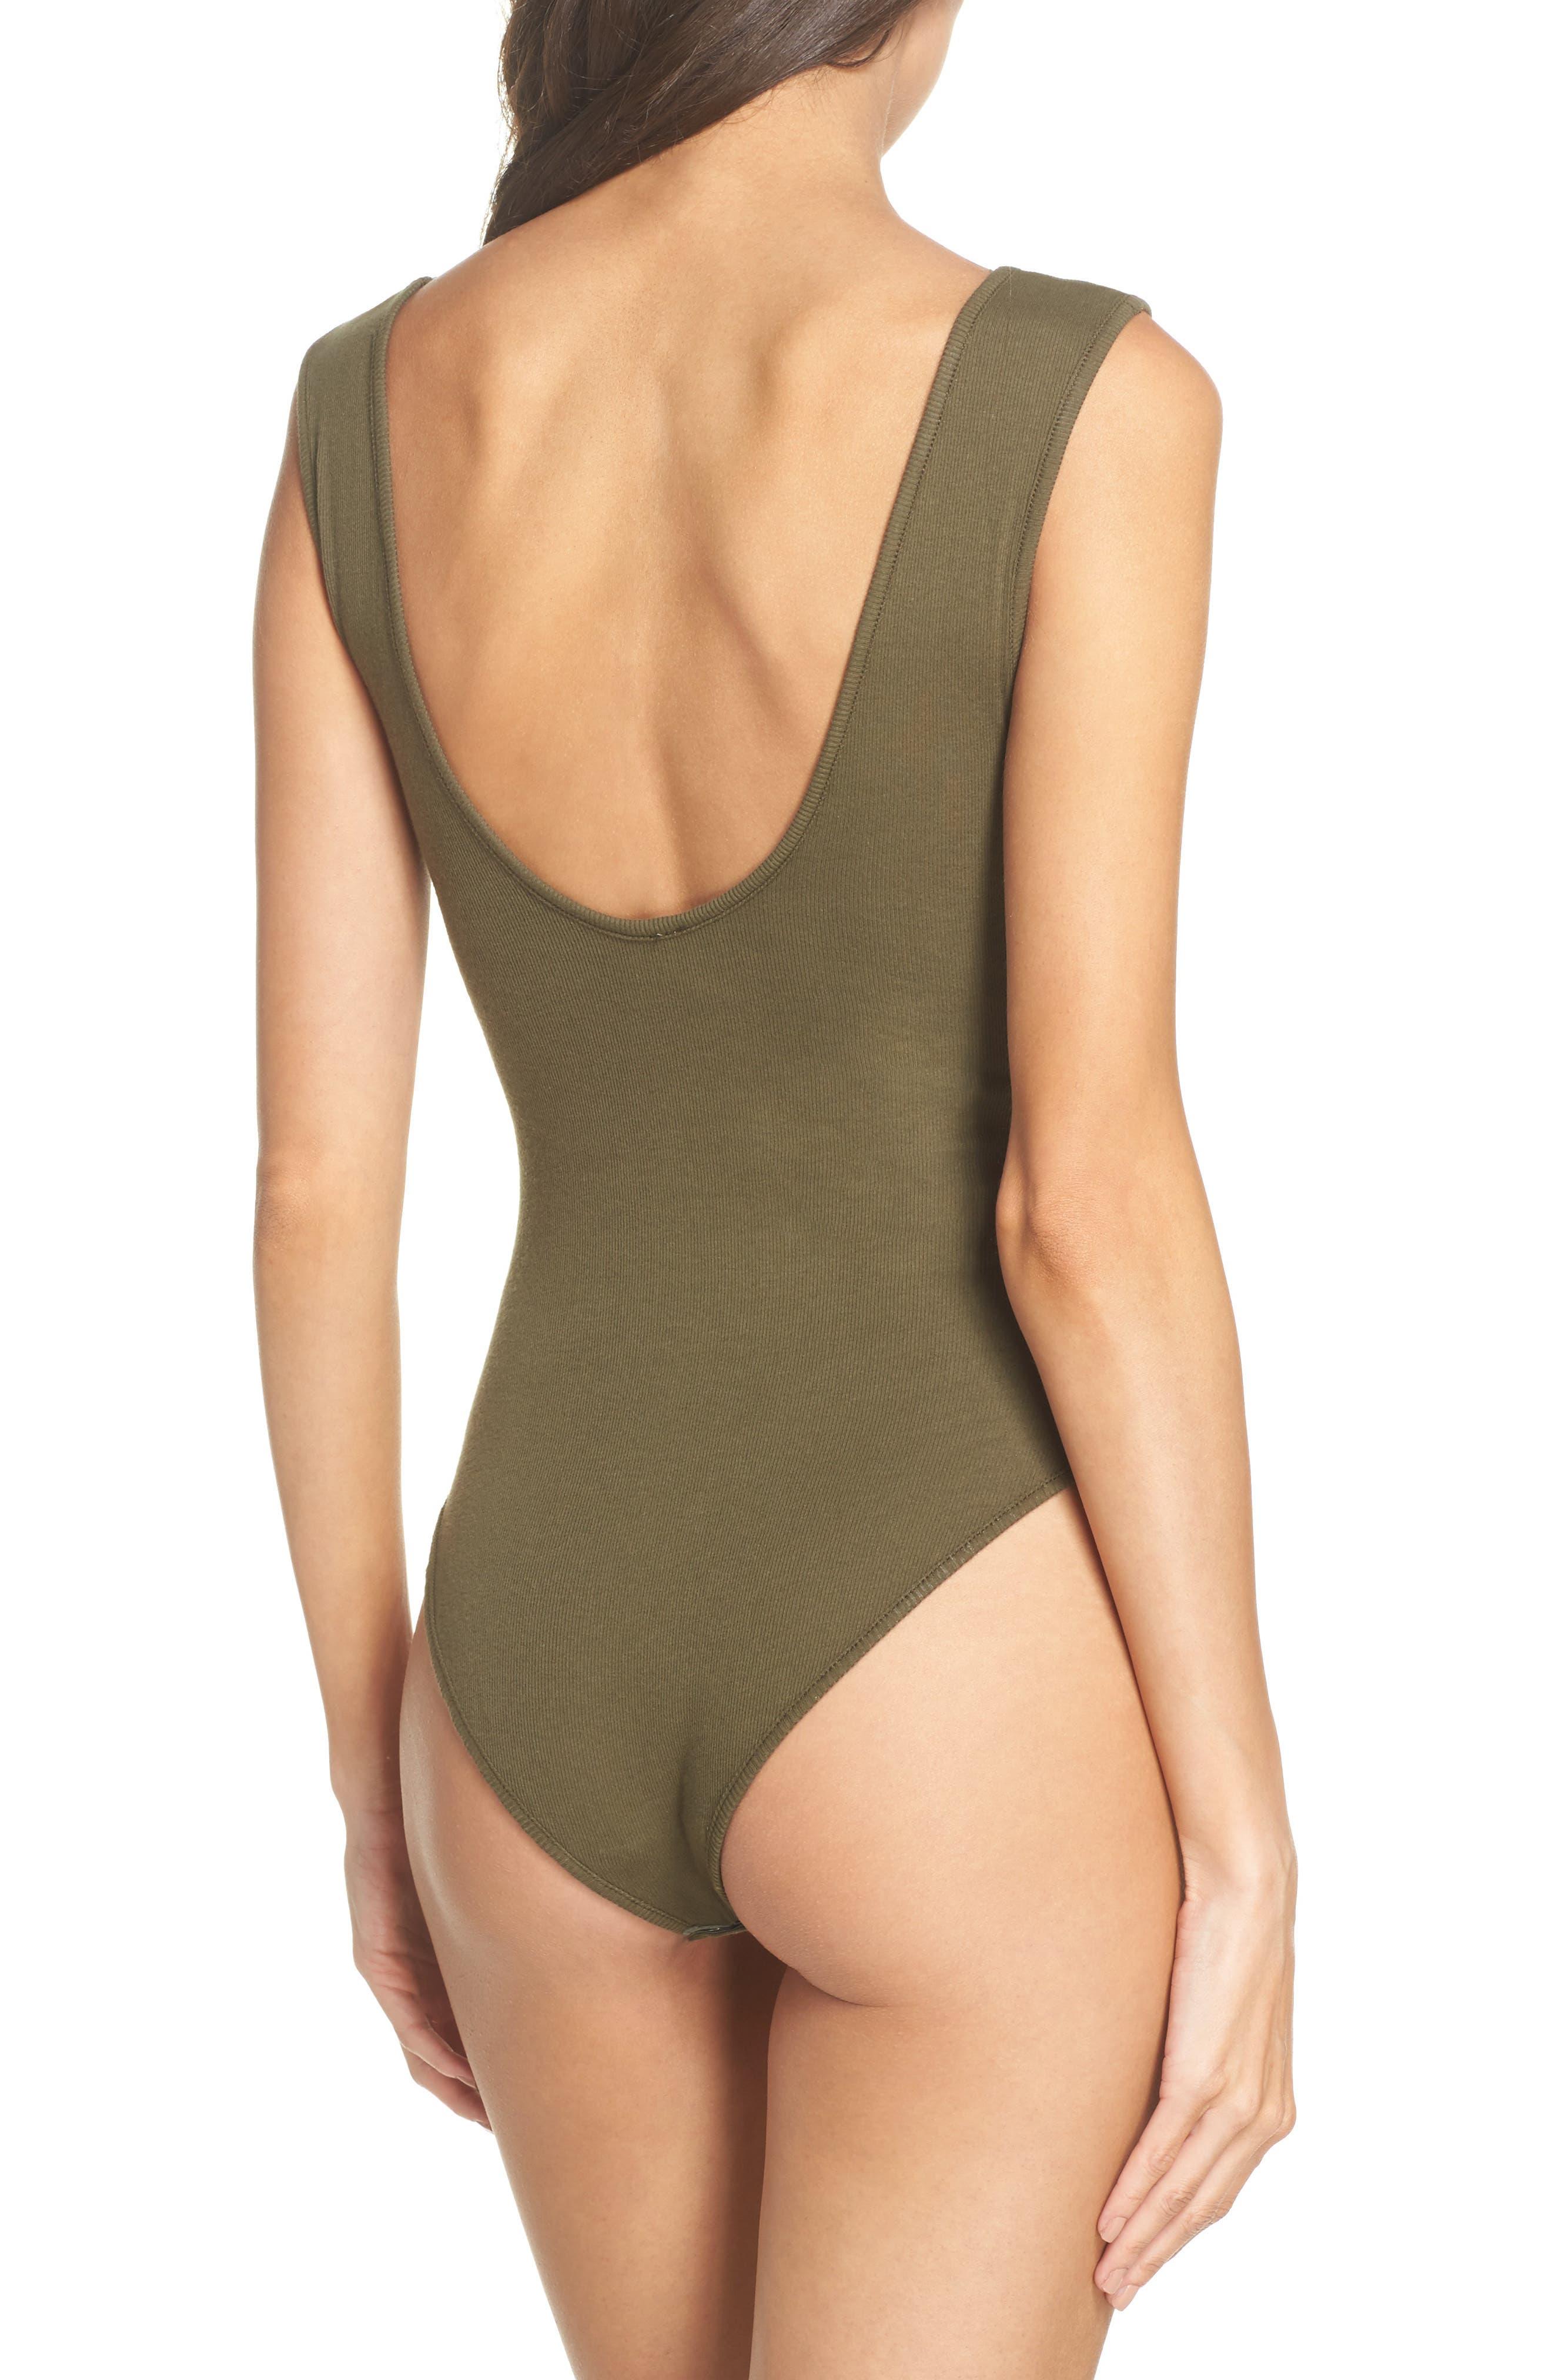 Intimately FP Tank Bodysuit,                             Alternate thumbnail 2, color,                             Army